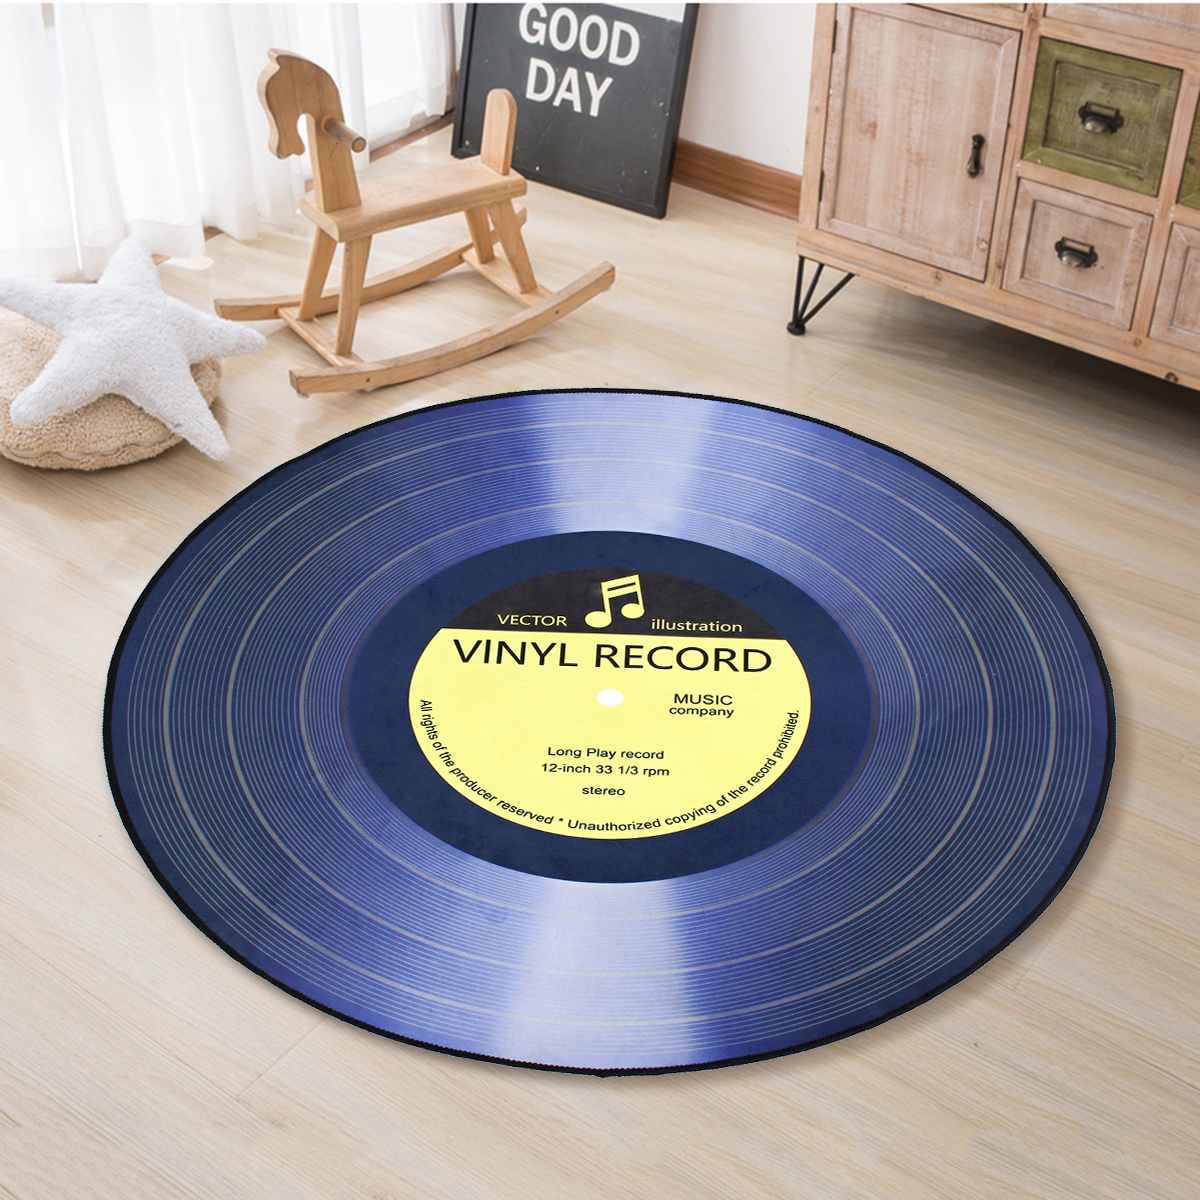 Us 8 0 24 Off 4 Sizes Round Carpet Rugs Floor Mat 3d Vinyl Record Printed Carpets Bedroom Kids Room Chair Home Decor Living Room Anti Slip In Carpet